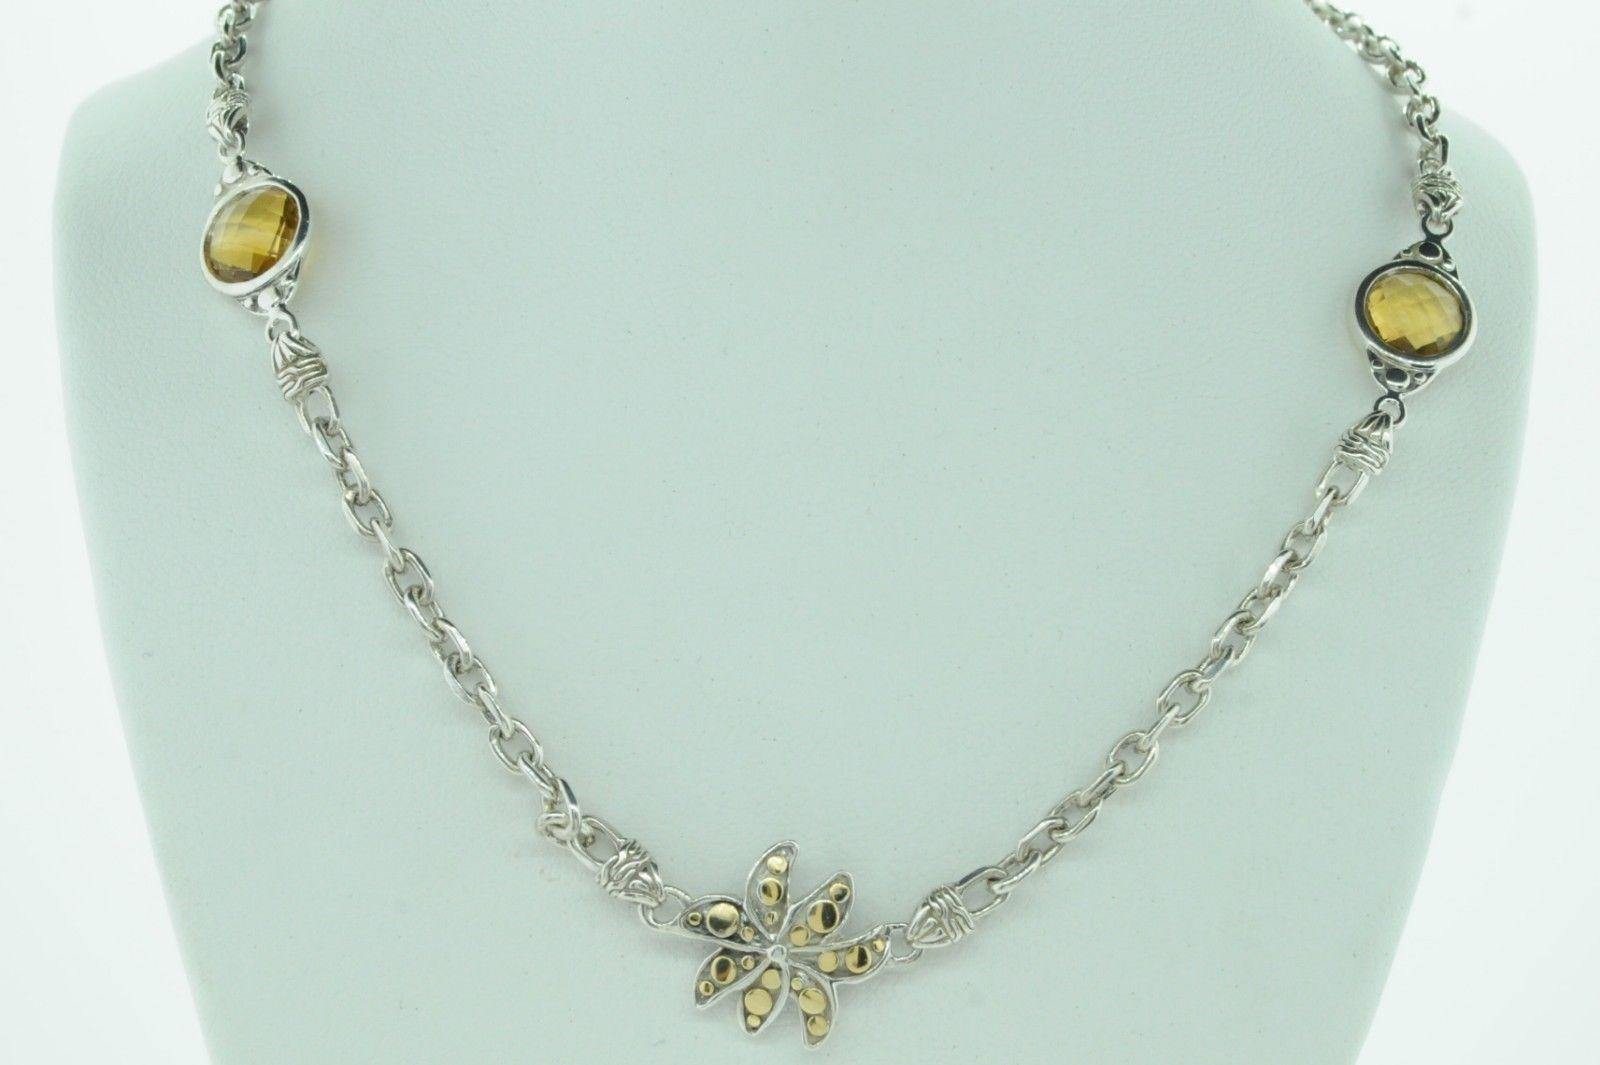 "JOHN HARDY Sterling Silver 18K Yellow Gold Ayu Frangipani Citrine Necklace (24"")"